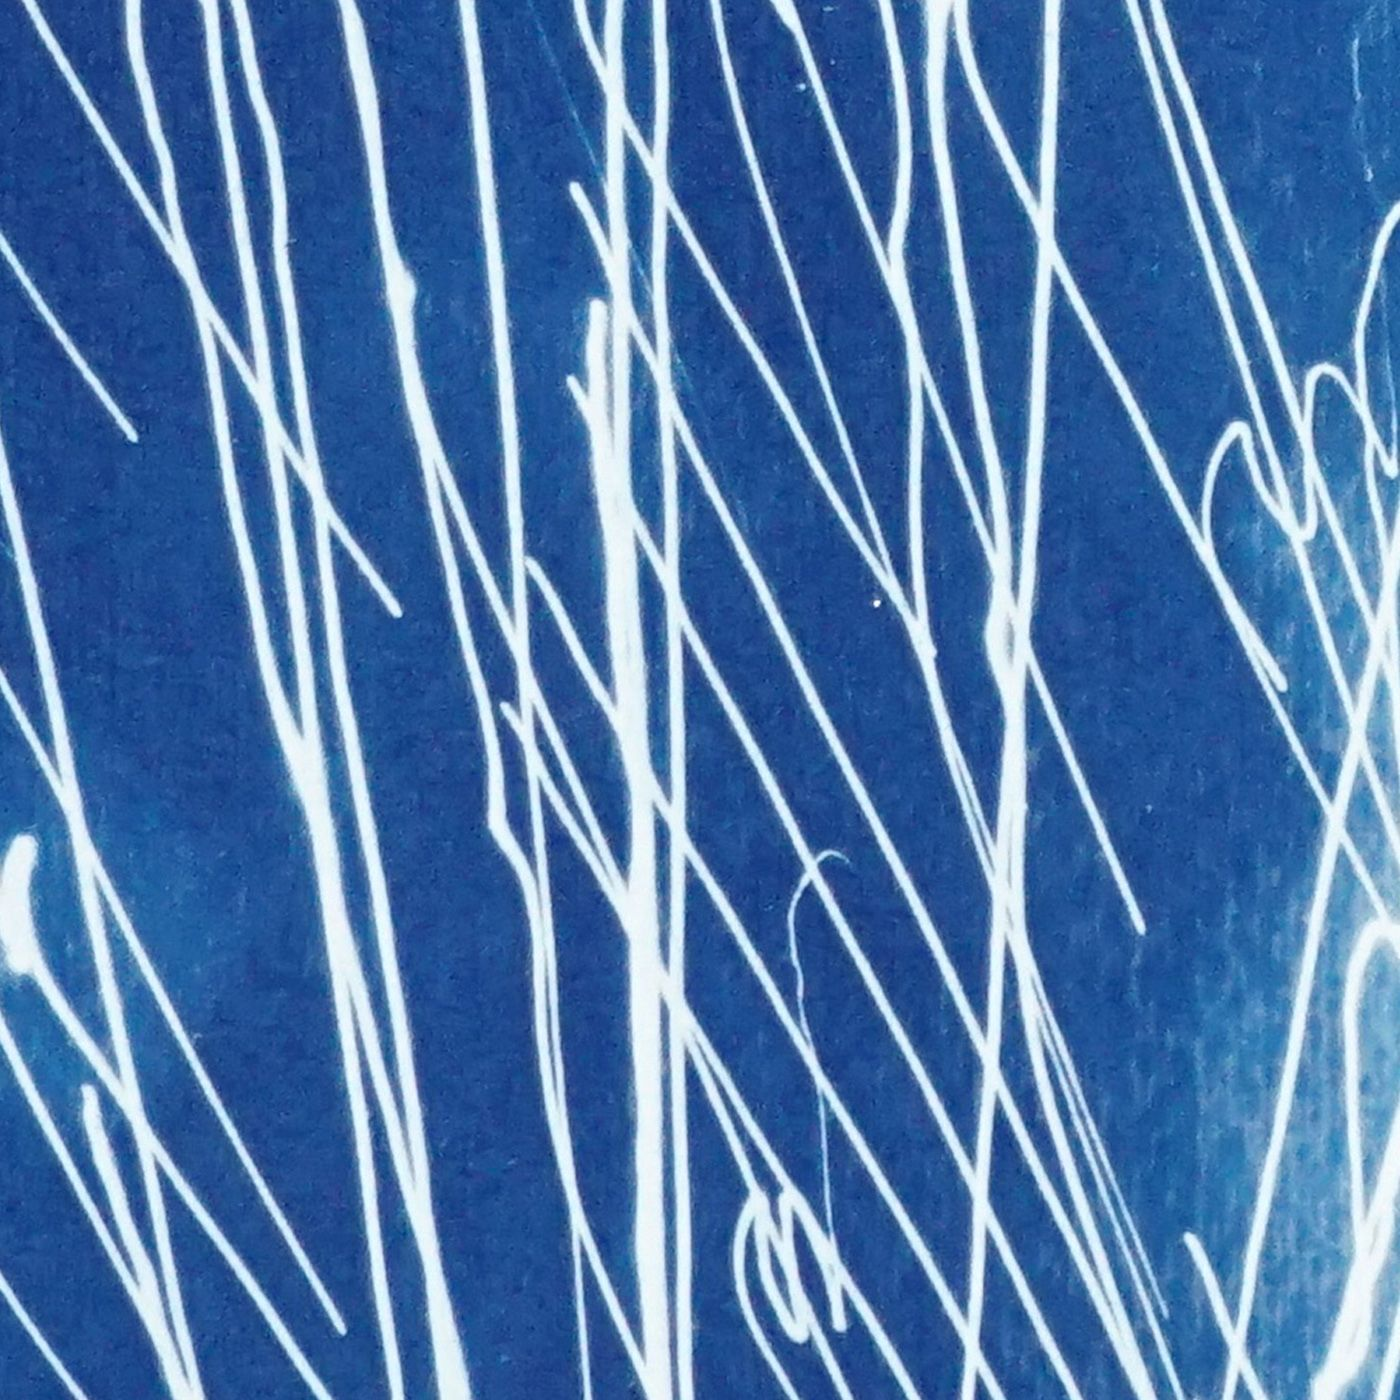 Firework Lights Handmade Cyanotype Art Print   Bombinate